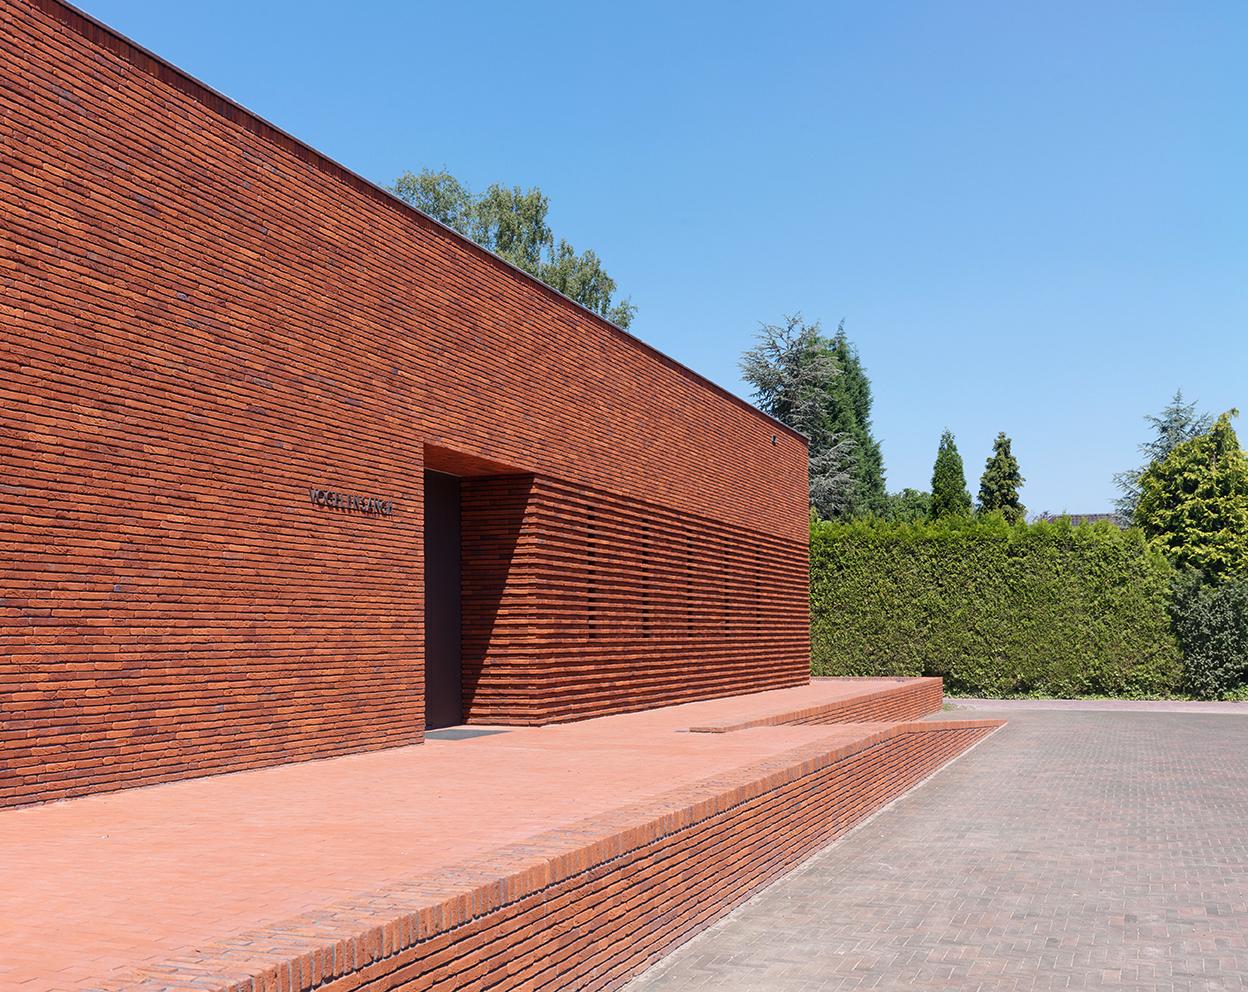 Gallery Of Pavilion Brick Factory Vogelensangh Bedaux De